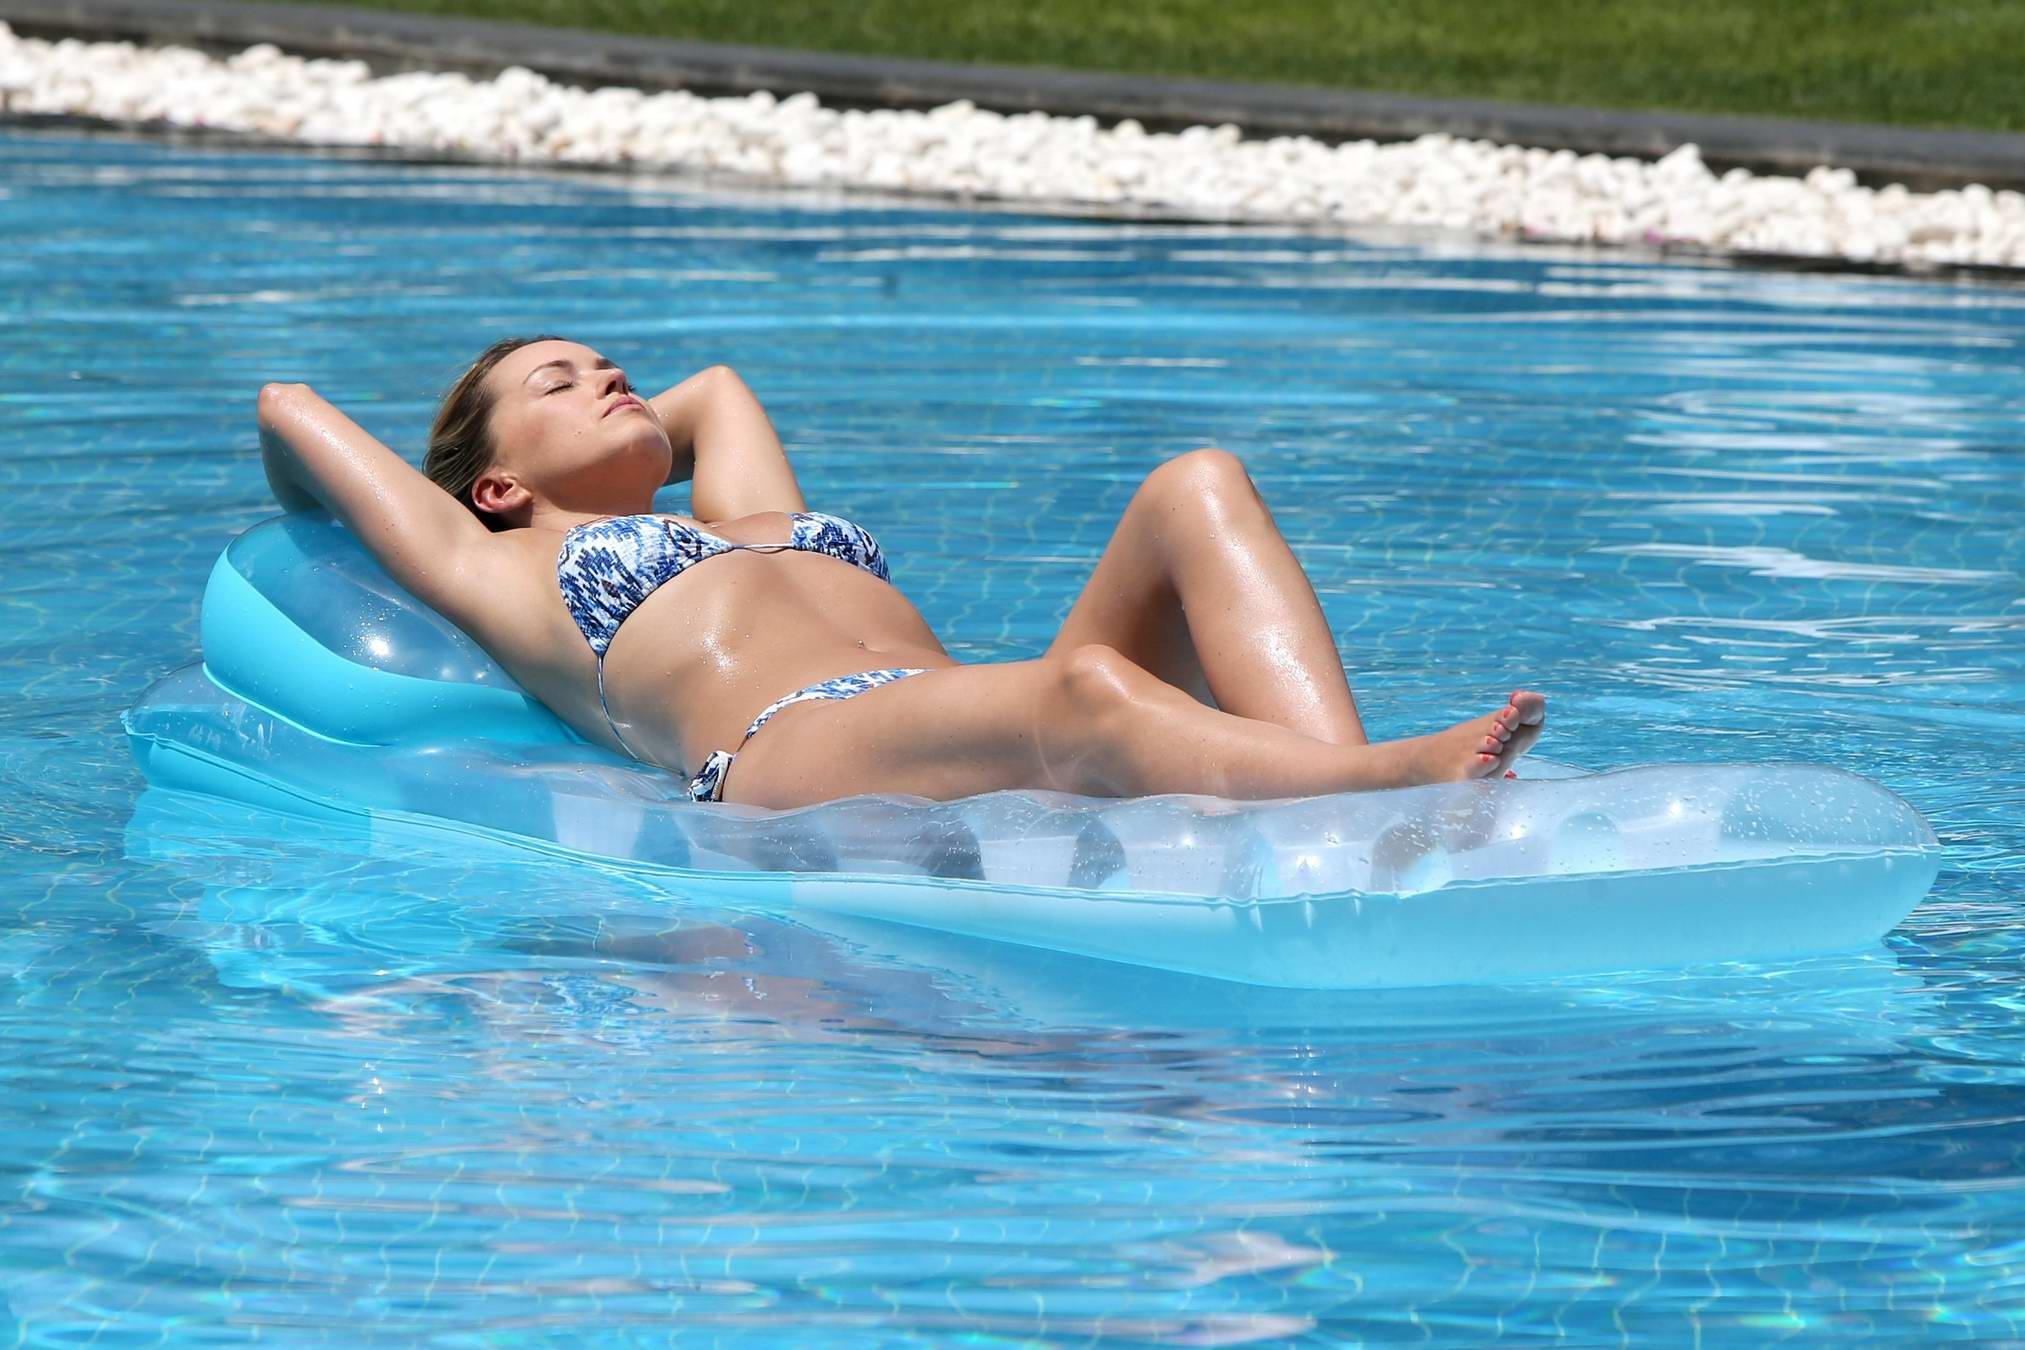 Forum on this topic: Eiza gonzalez tits, ola-jordan-bikini-poolside-in-dubai/